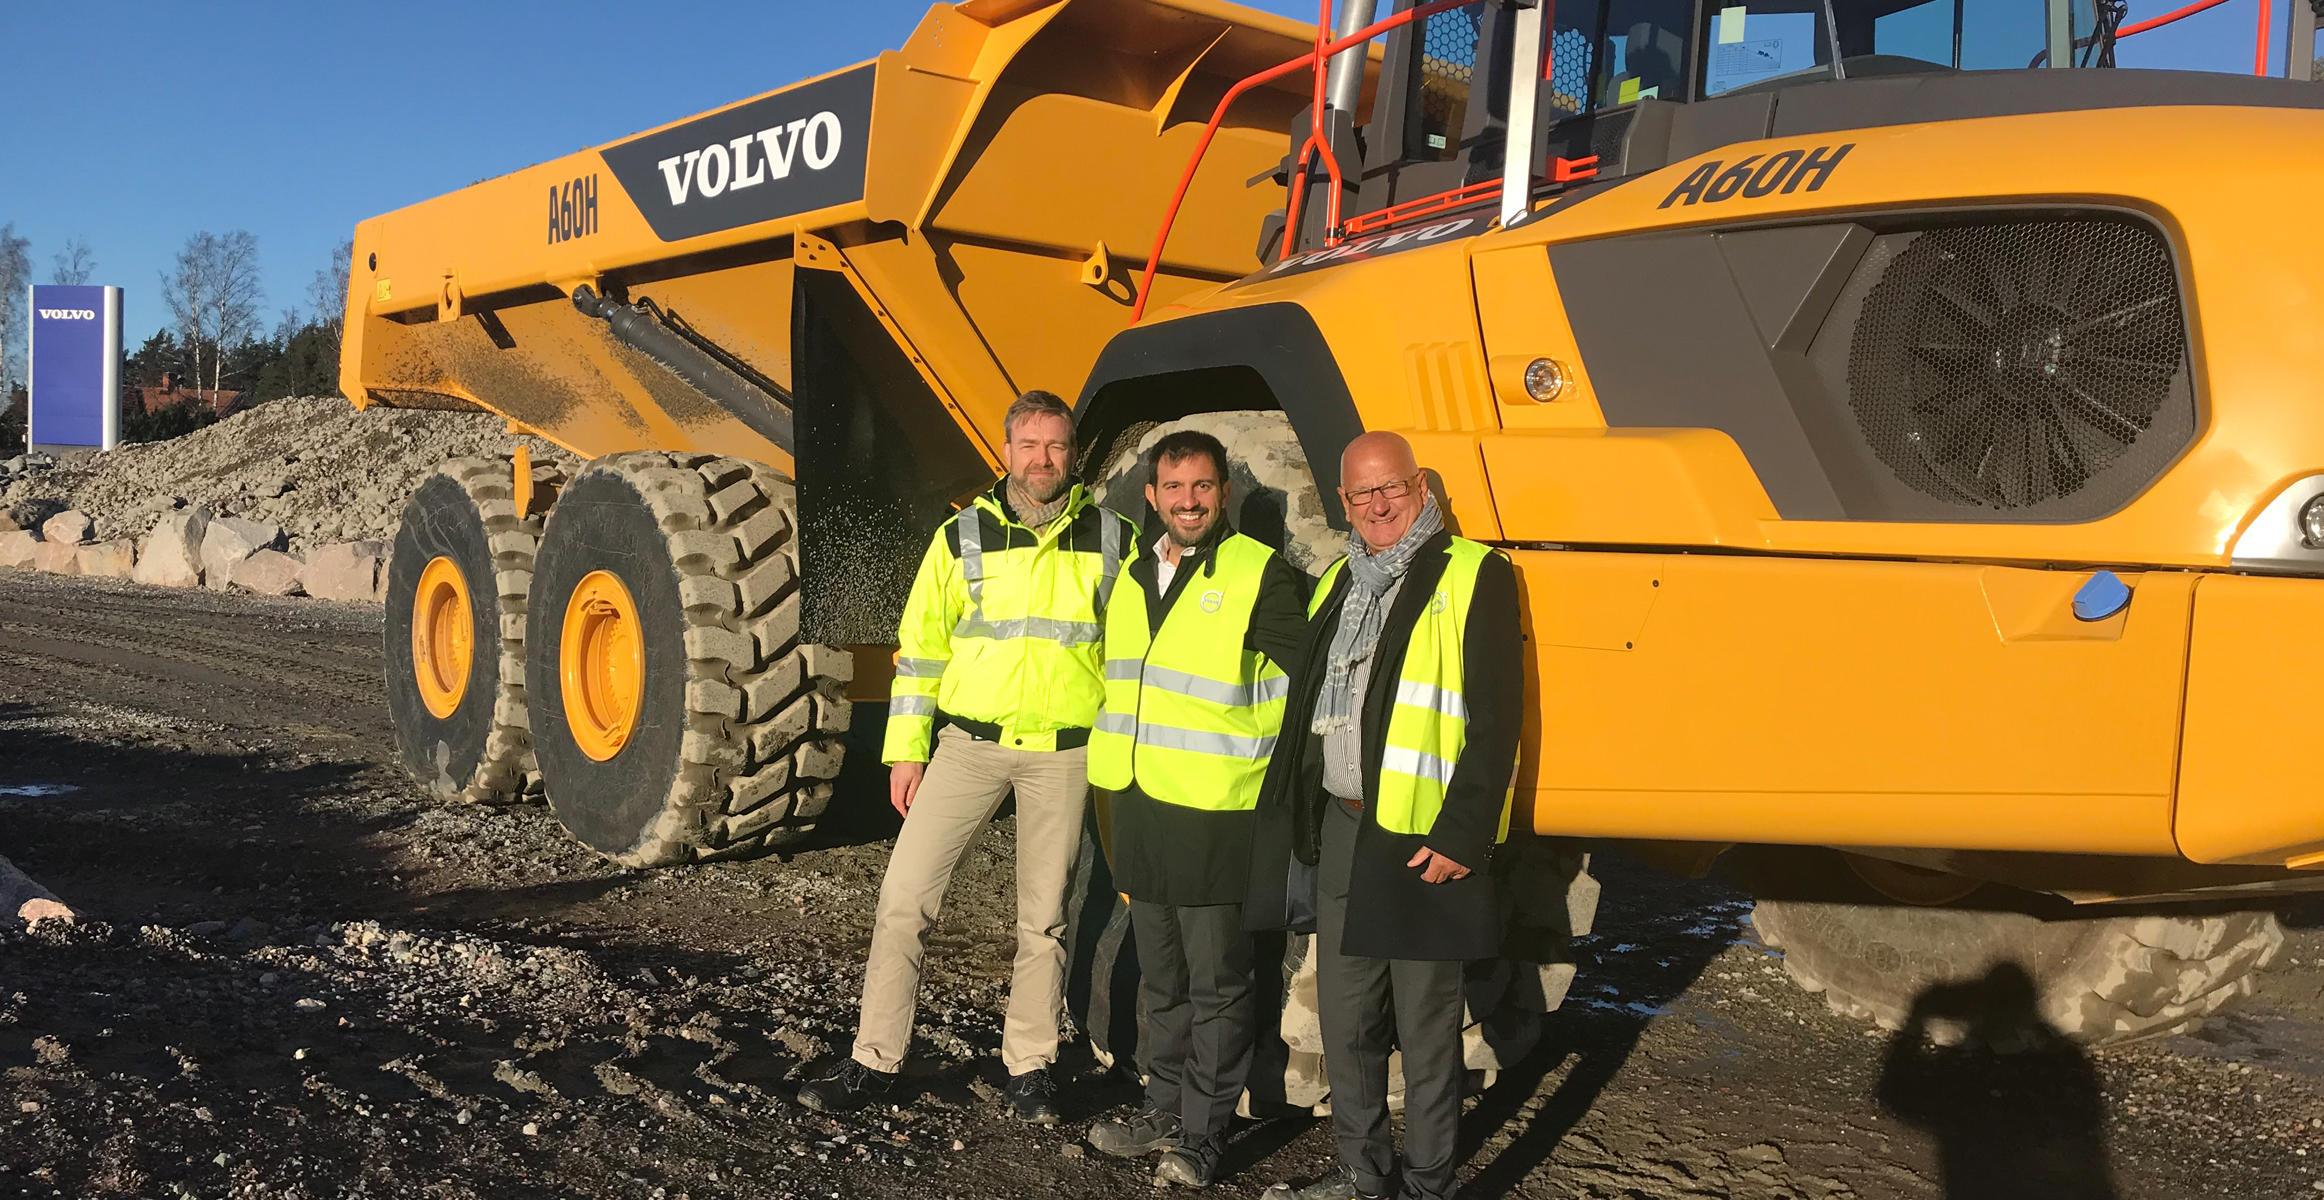 CECE Secretary General visits Volvo CE facilities in Eskilstuna : Volvo Construction Equipment